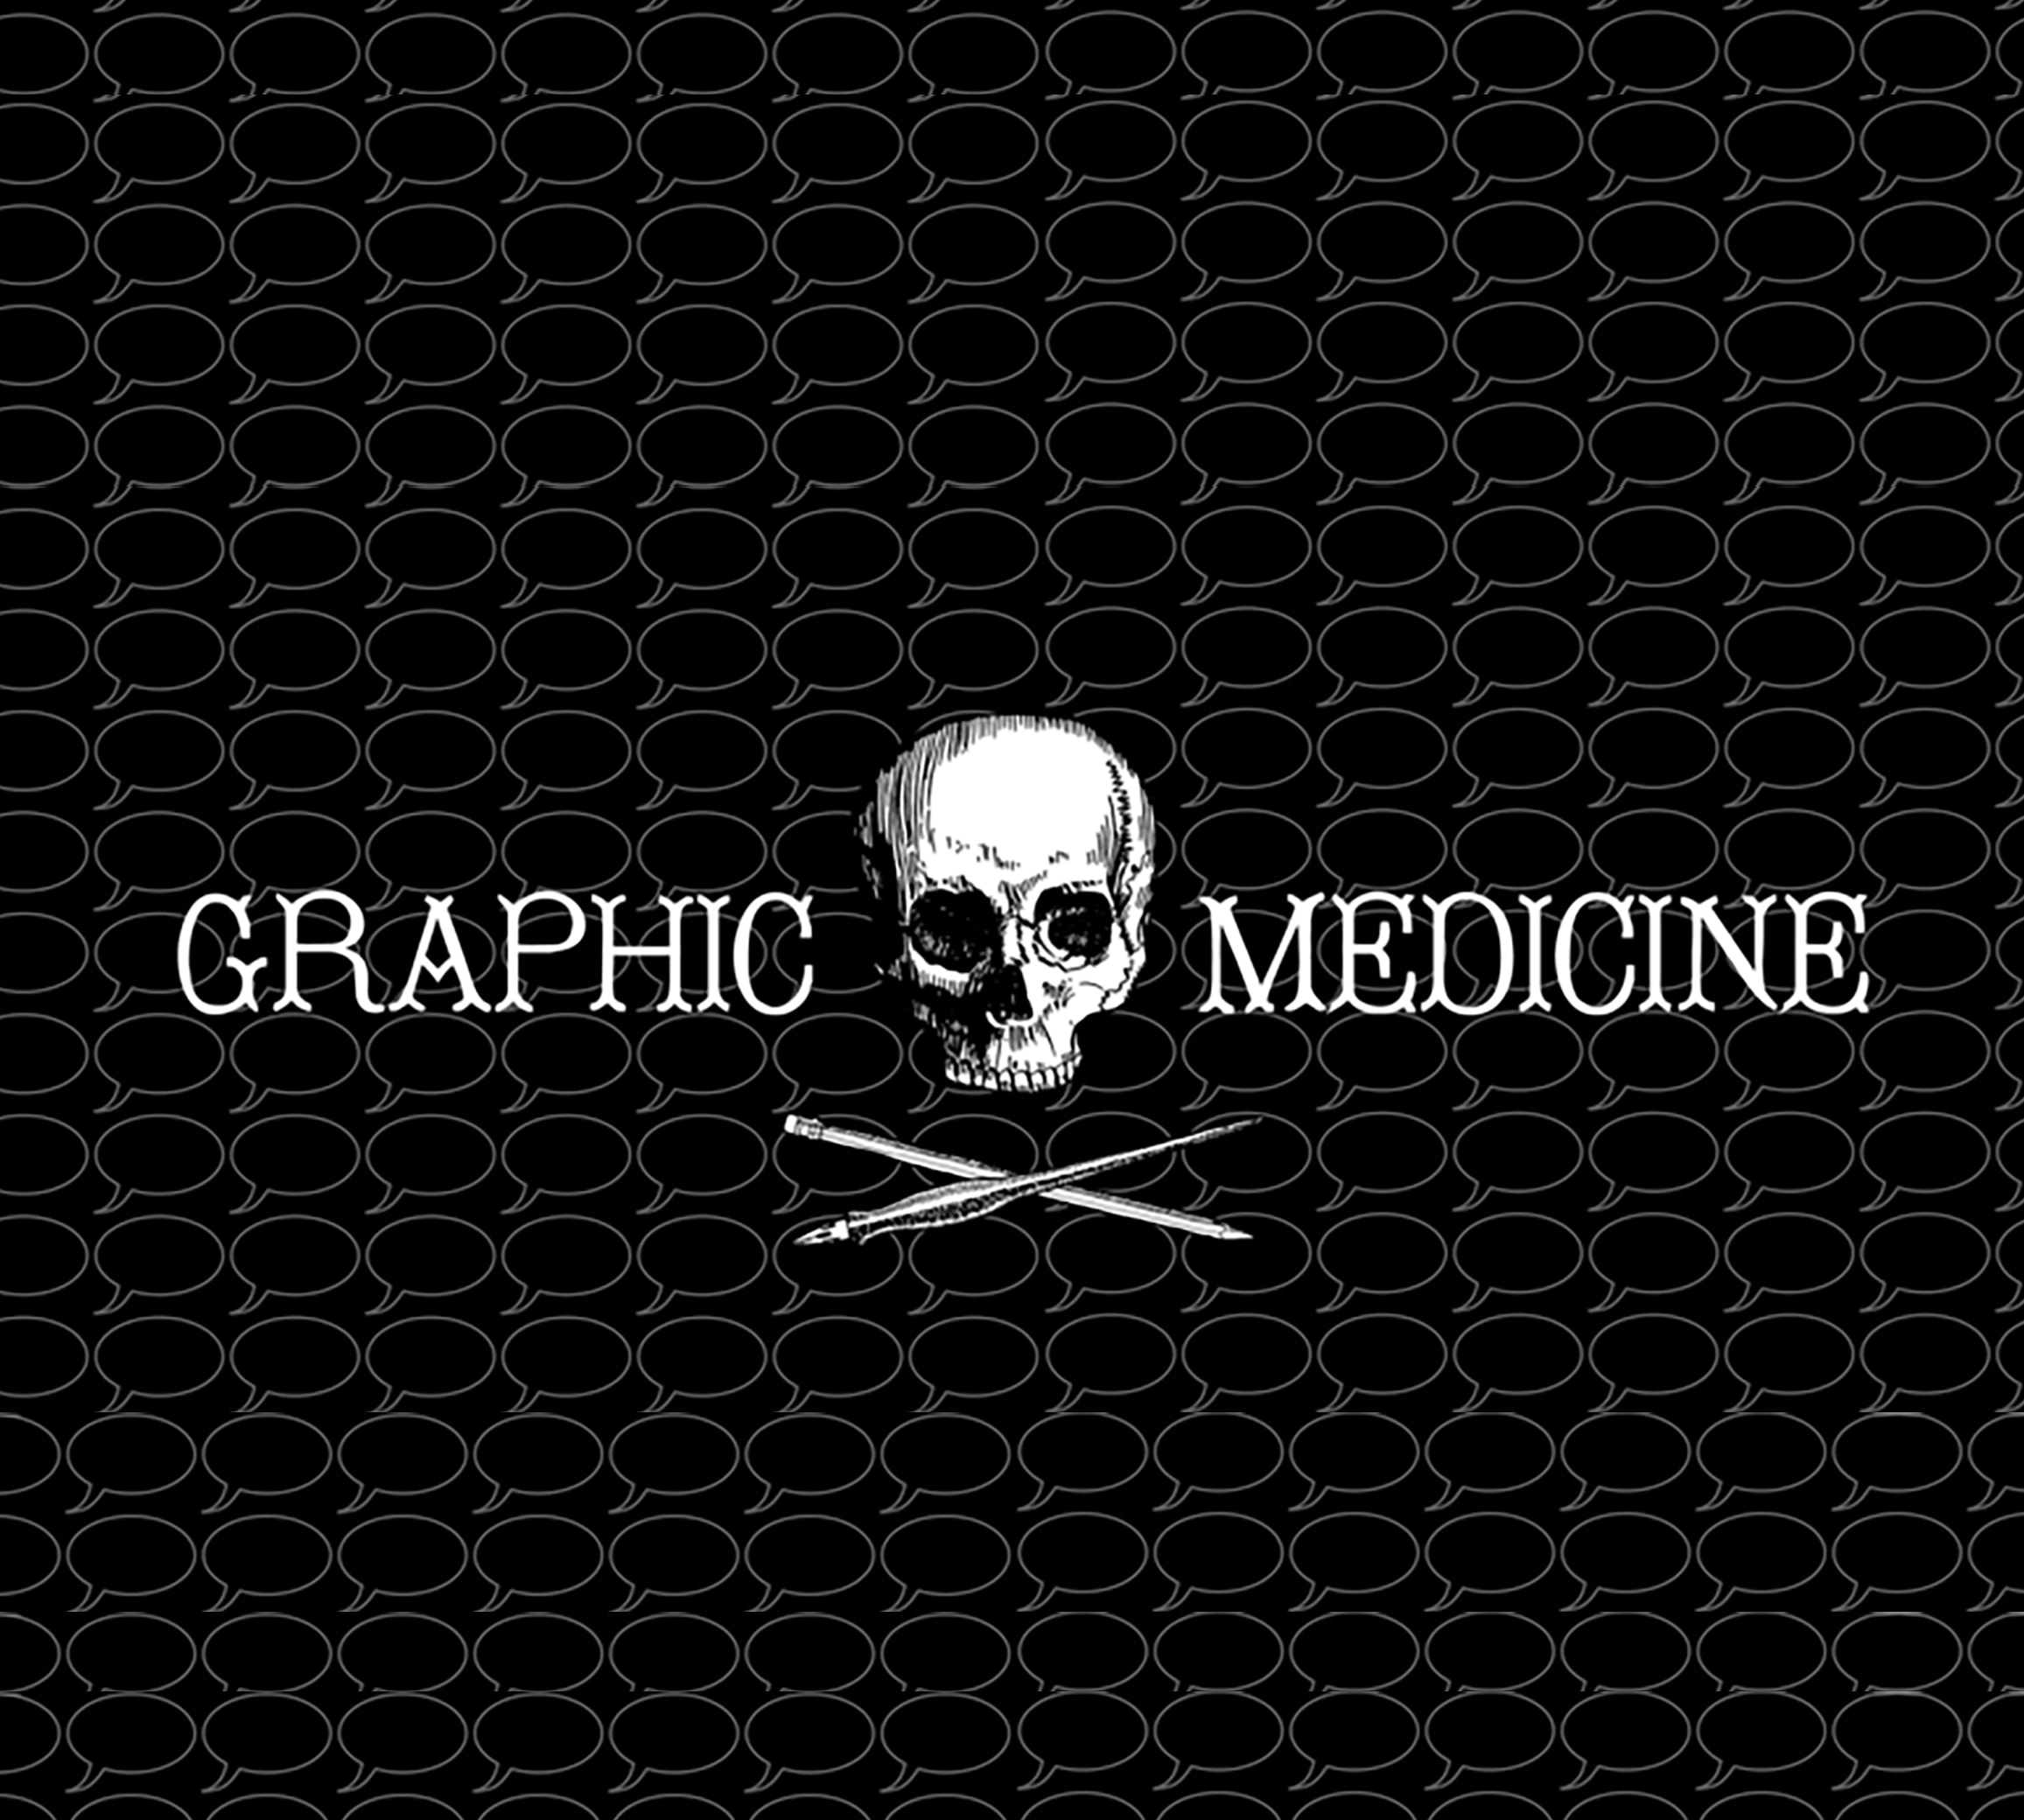 httpswwwgraphicmedicineorgwpcontentuploads